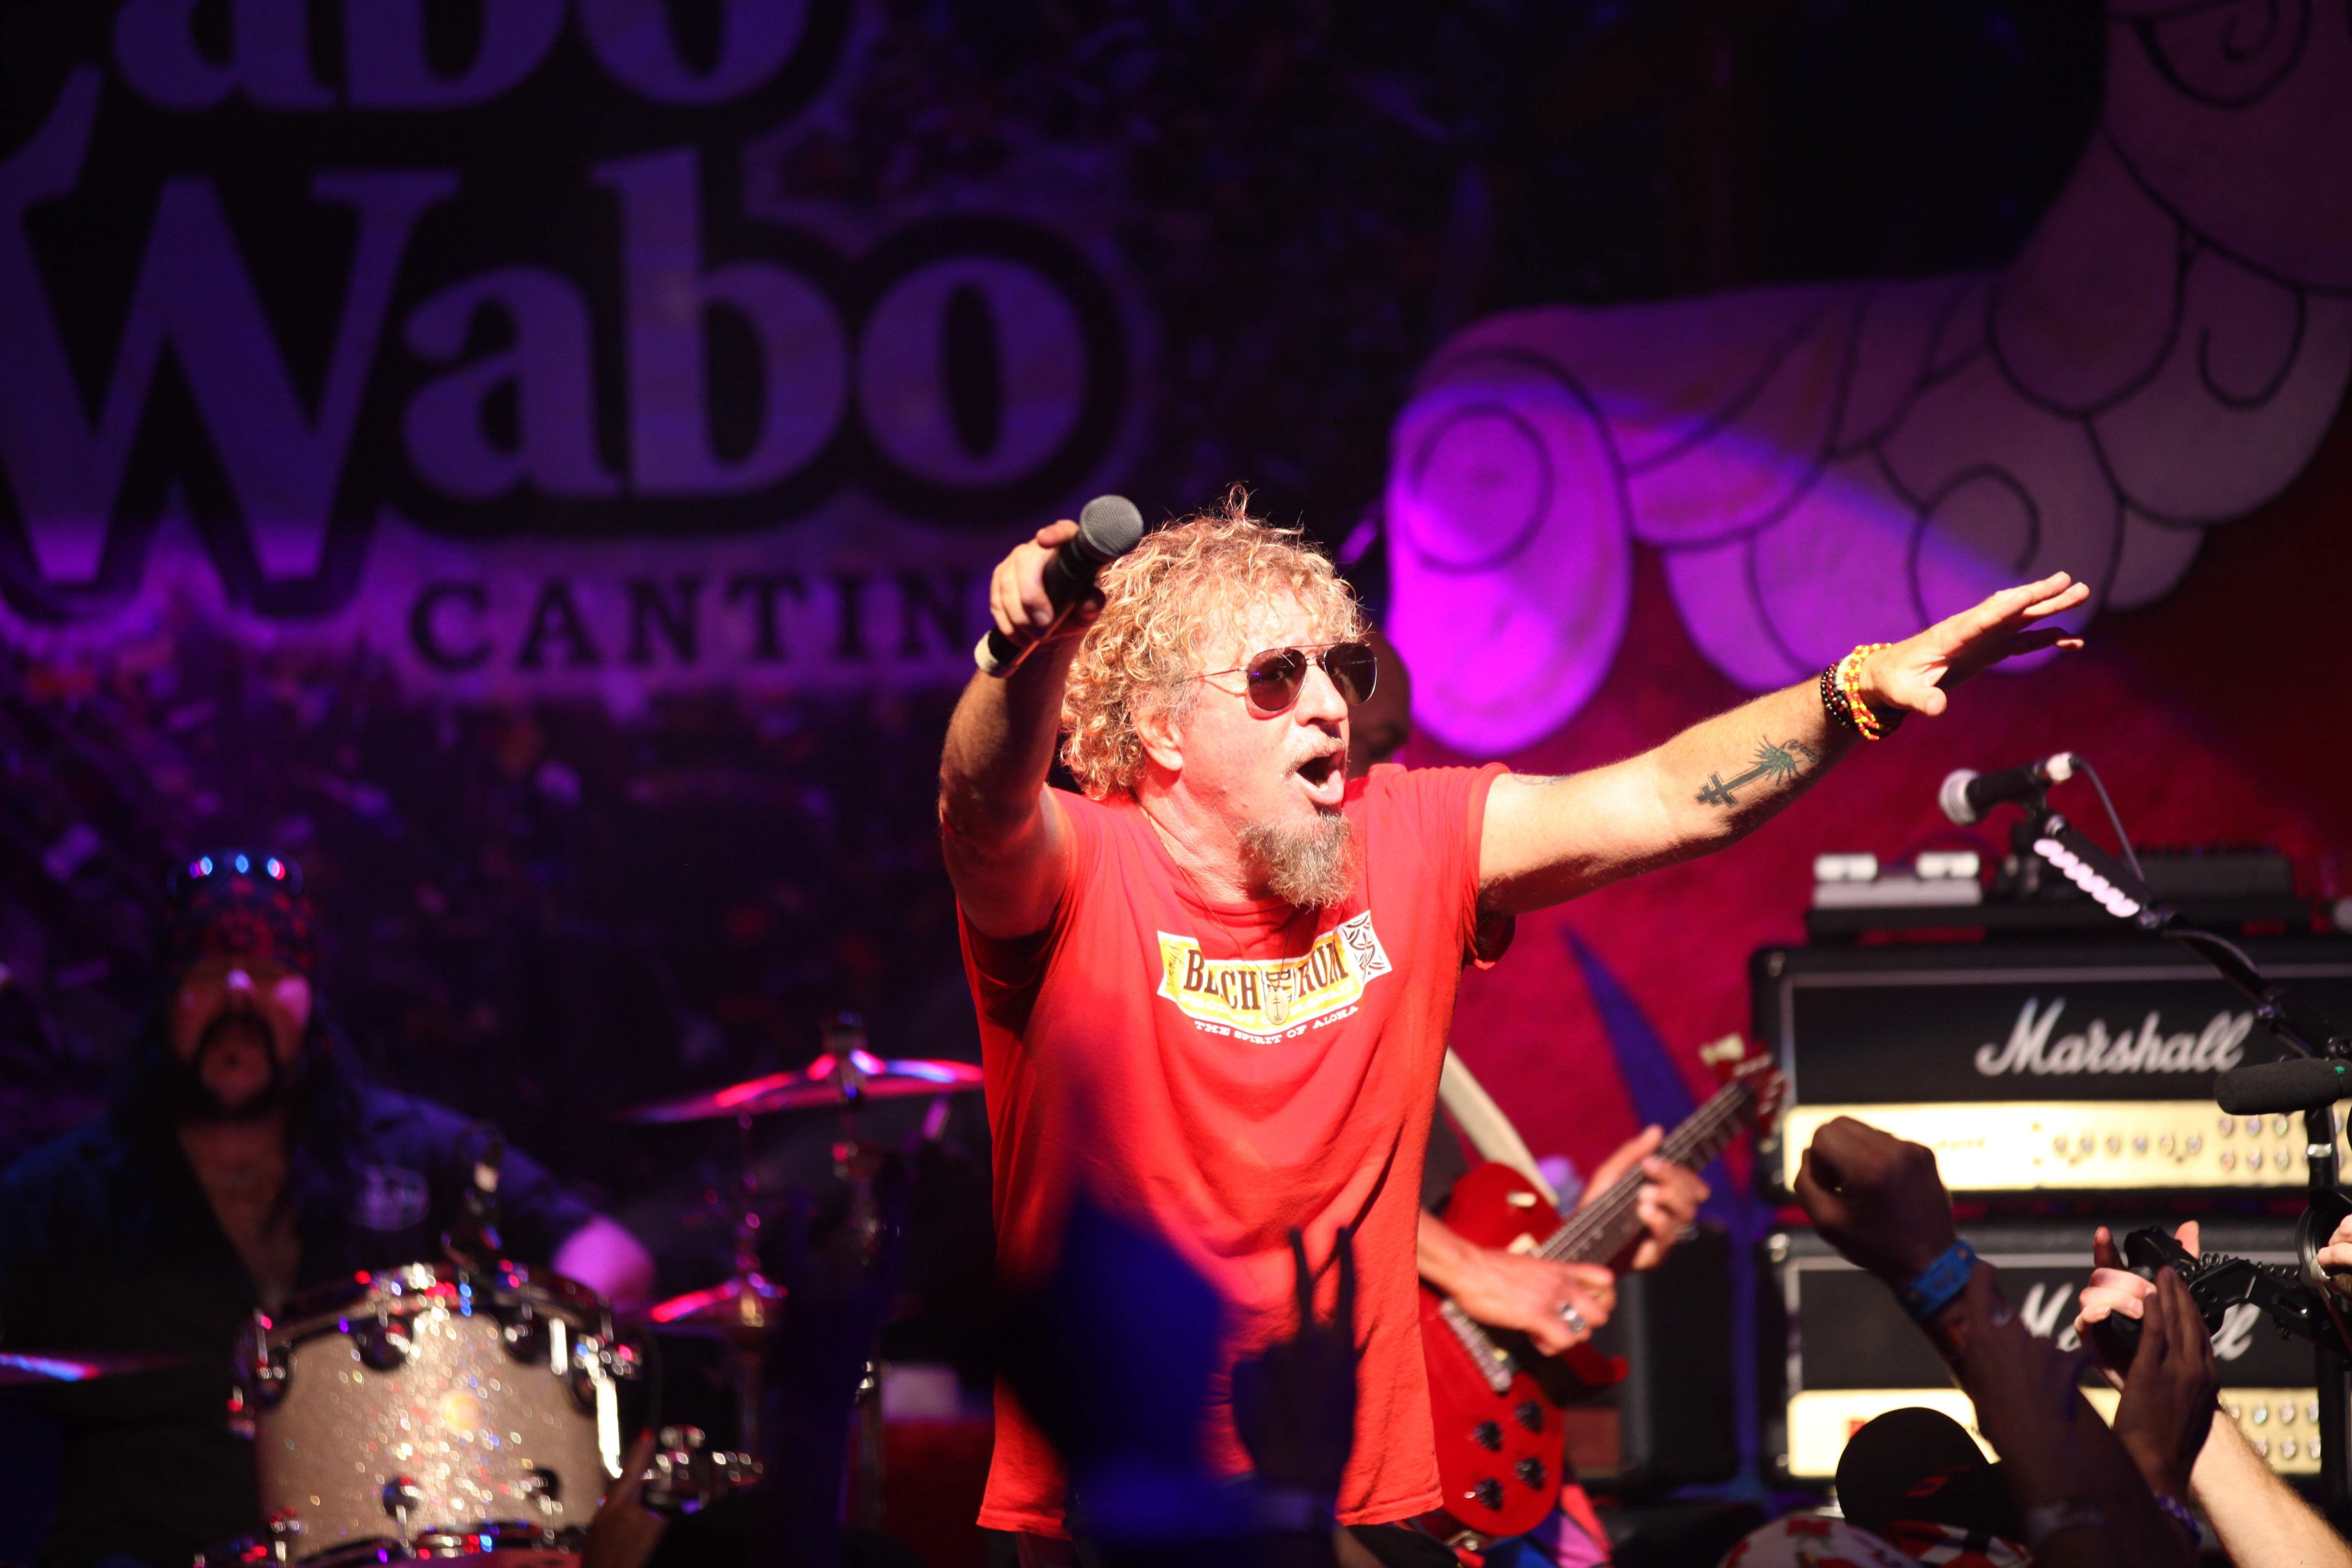 Handout Photo Of Sammy Hagar Taken At Hagar S 70th Birthday Bash In Cabo San Lucas Hagar Performs 11 14 17 At Coachman Park In Van Halen Concert Sammy Hagar